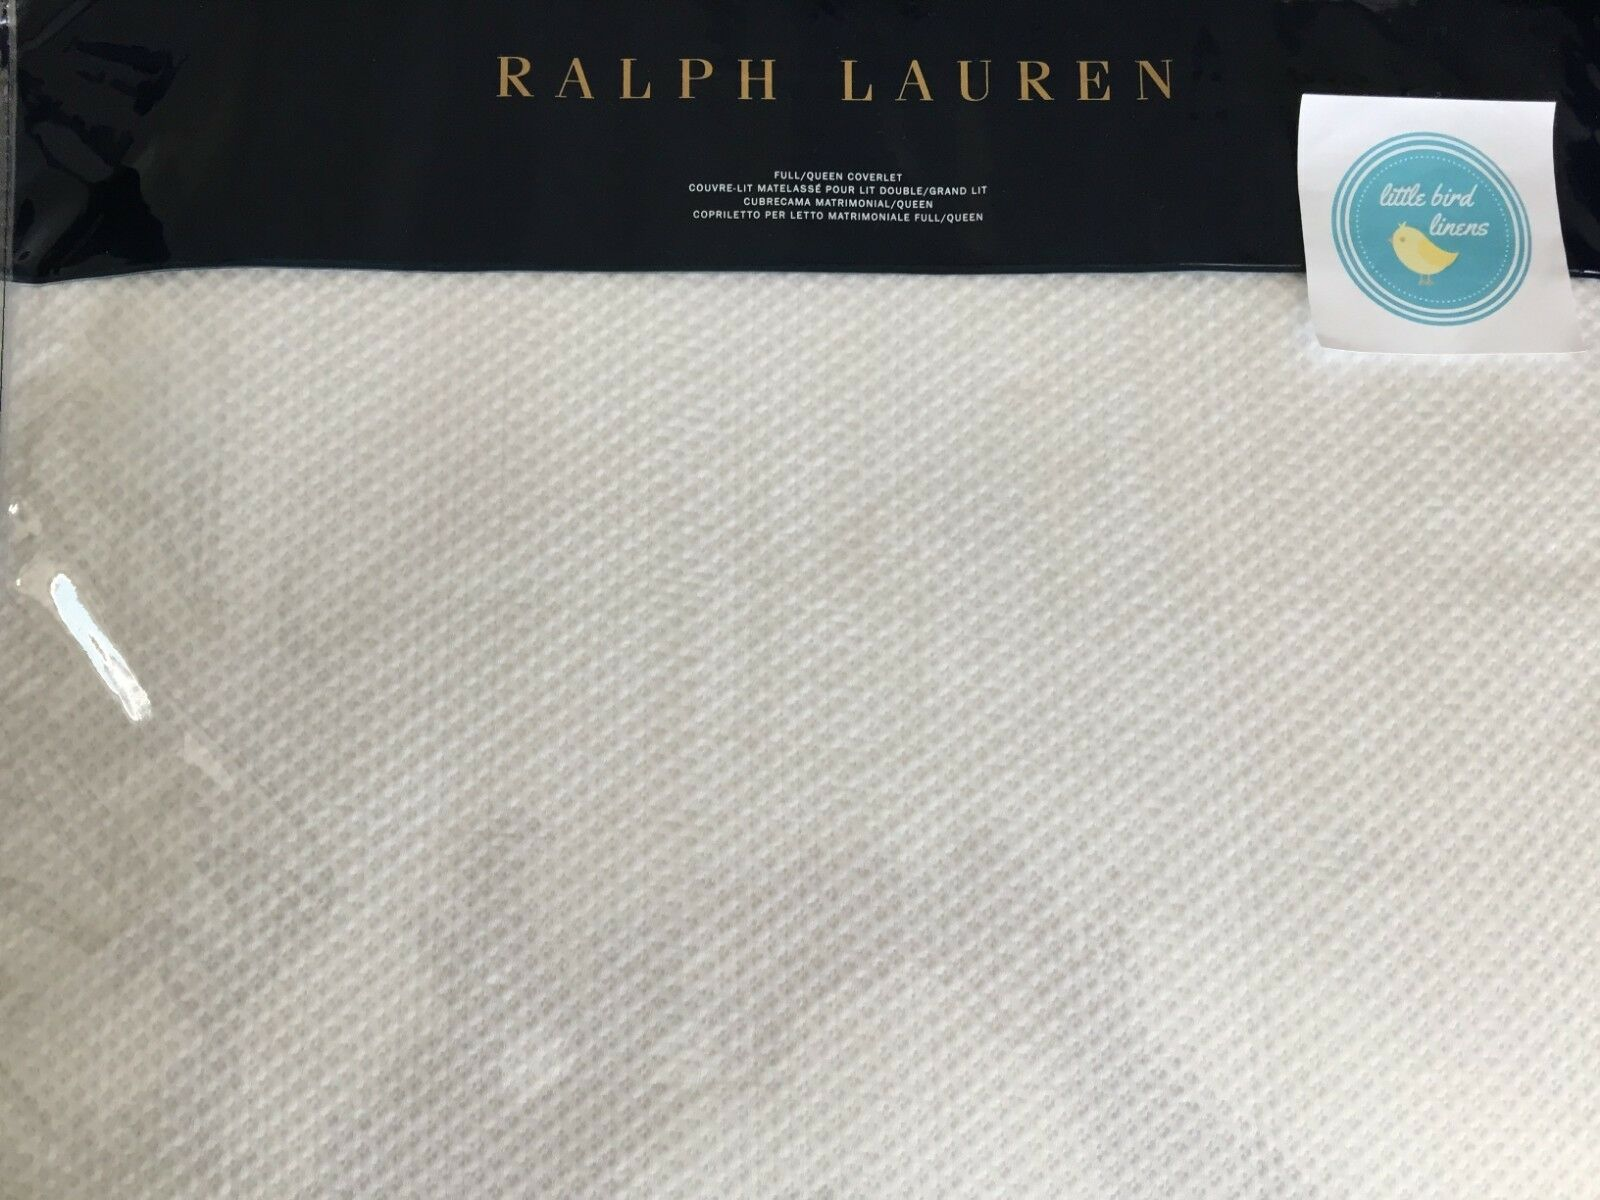 RALPH LAUREN ADELAIDE  bianca Full QUEEN COVERLET- New Matelasse Cotton